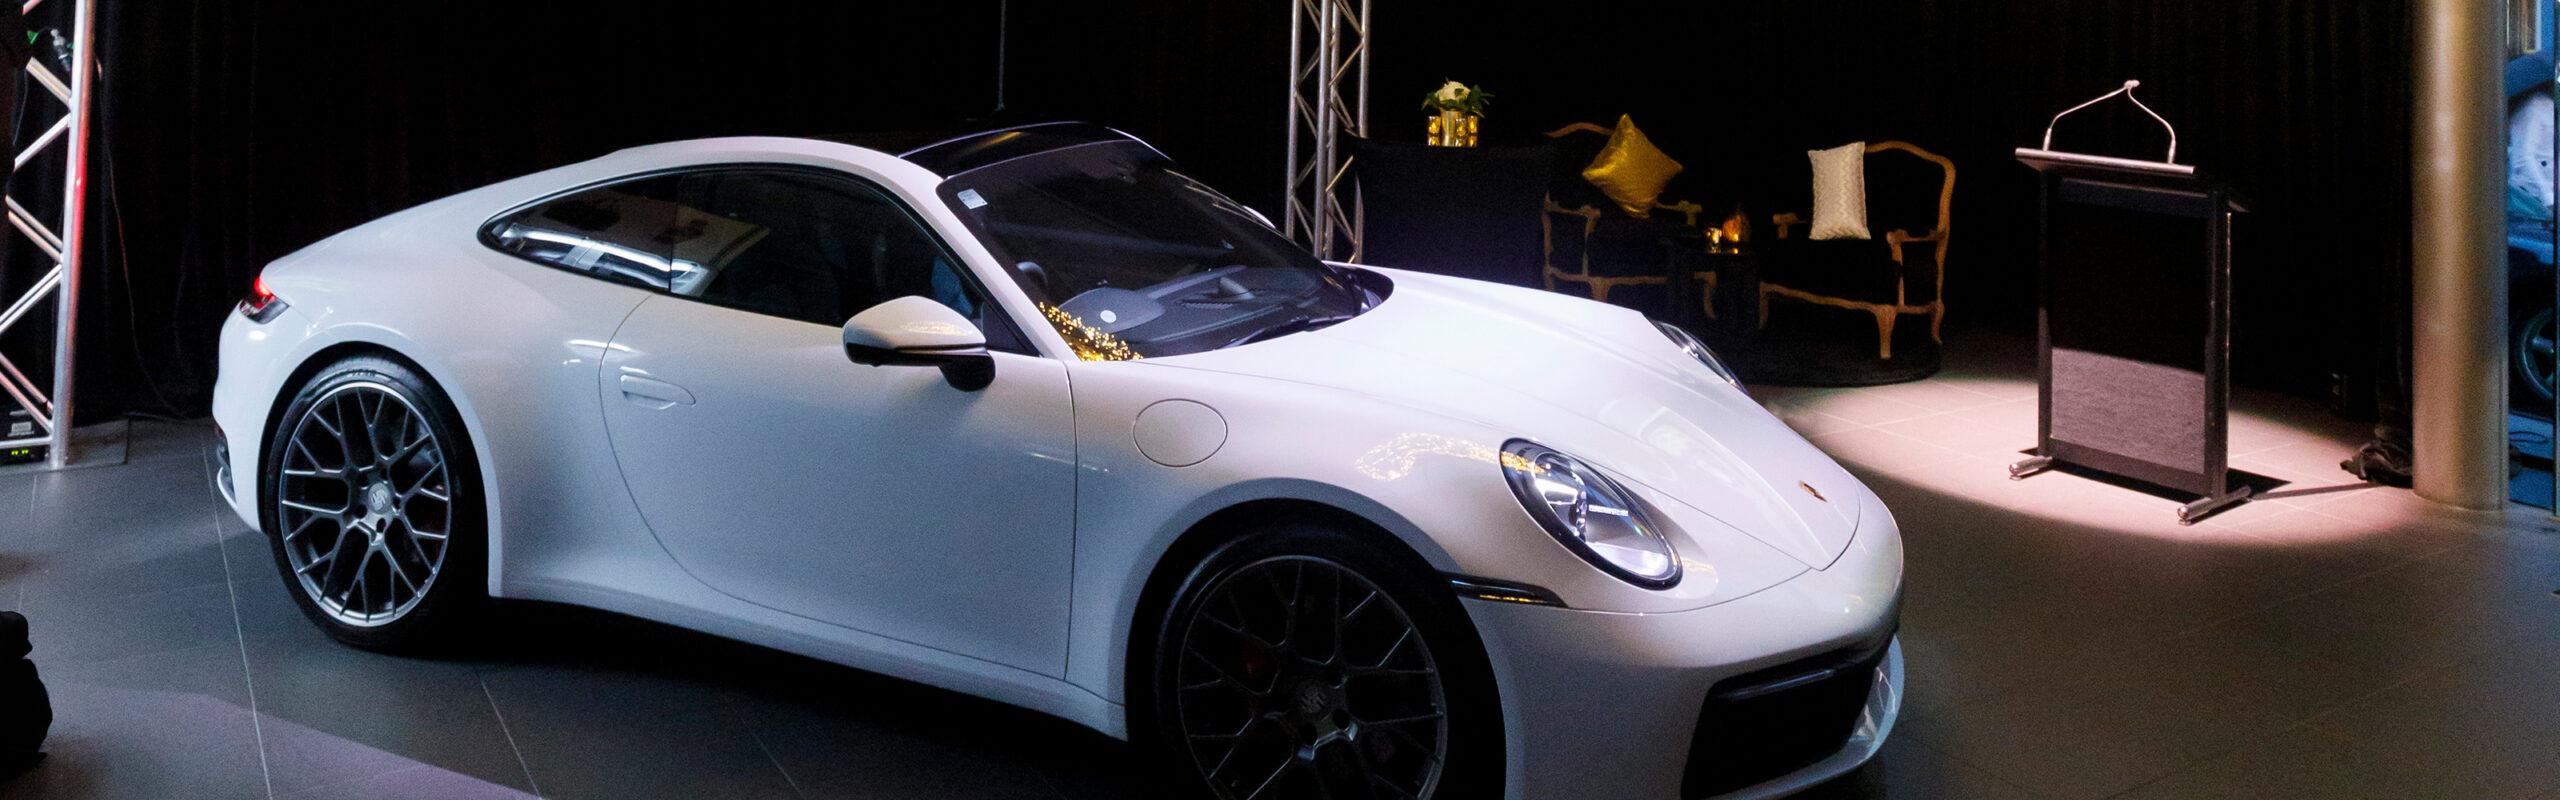 Cut the Mustard Product Launch // Porsche 911 Launch 2019